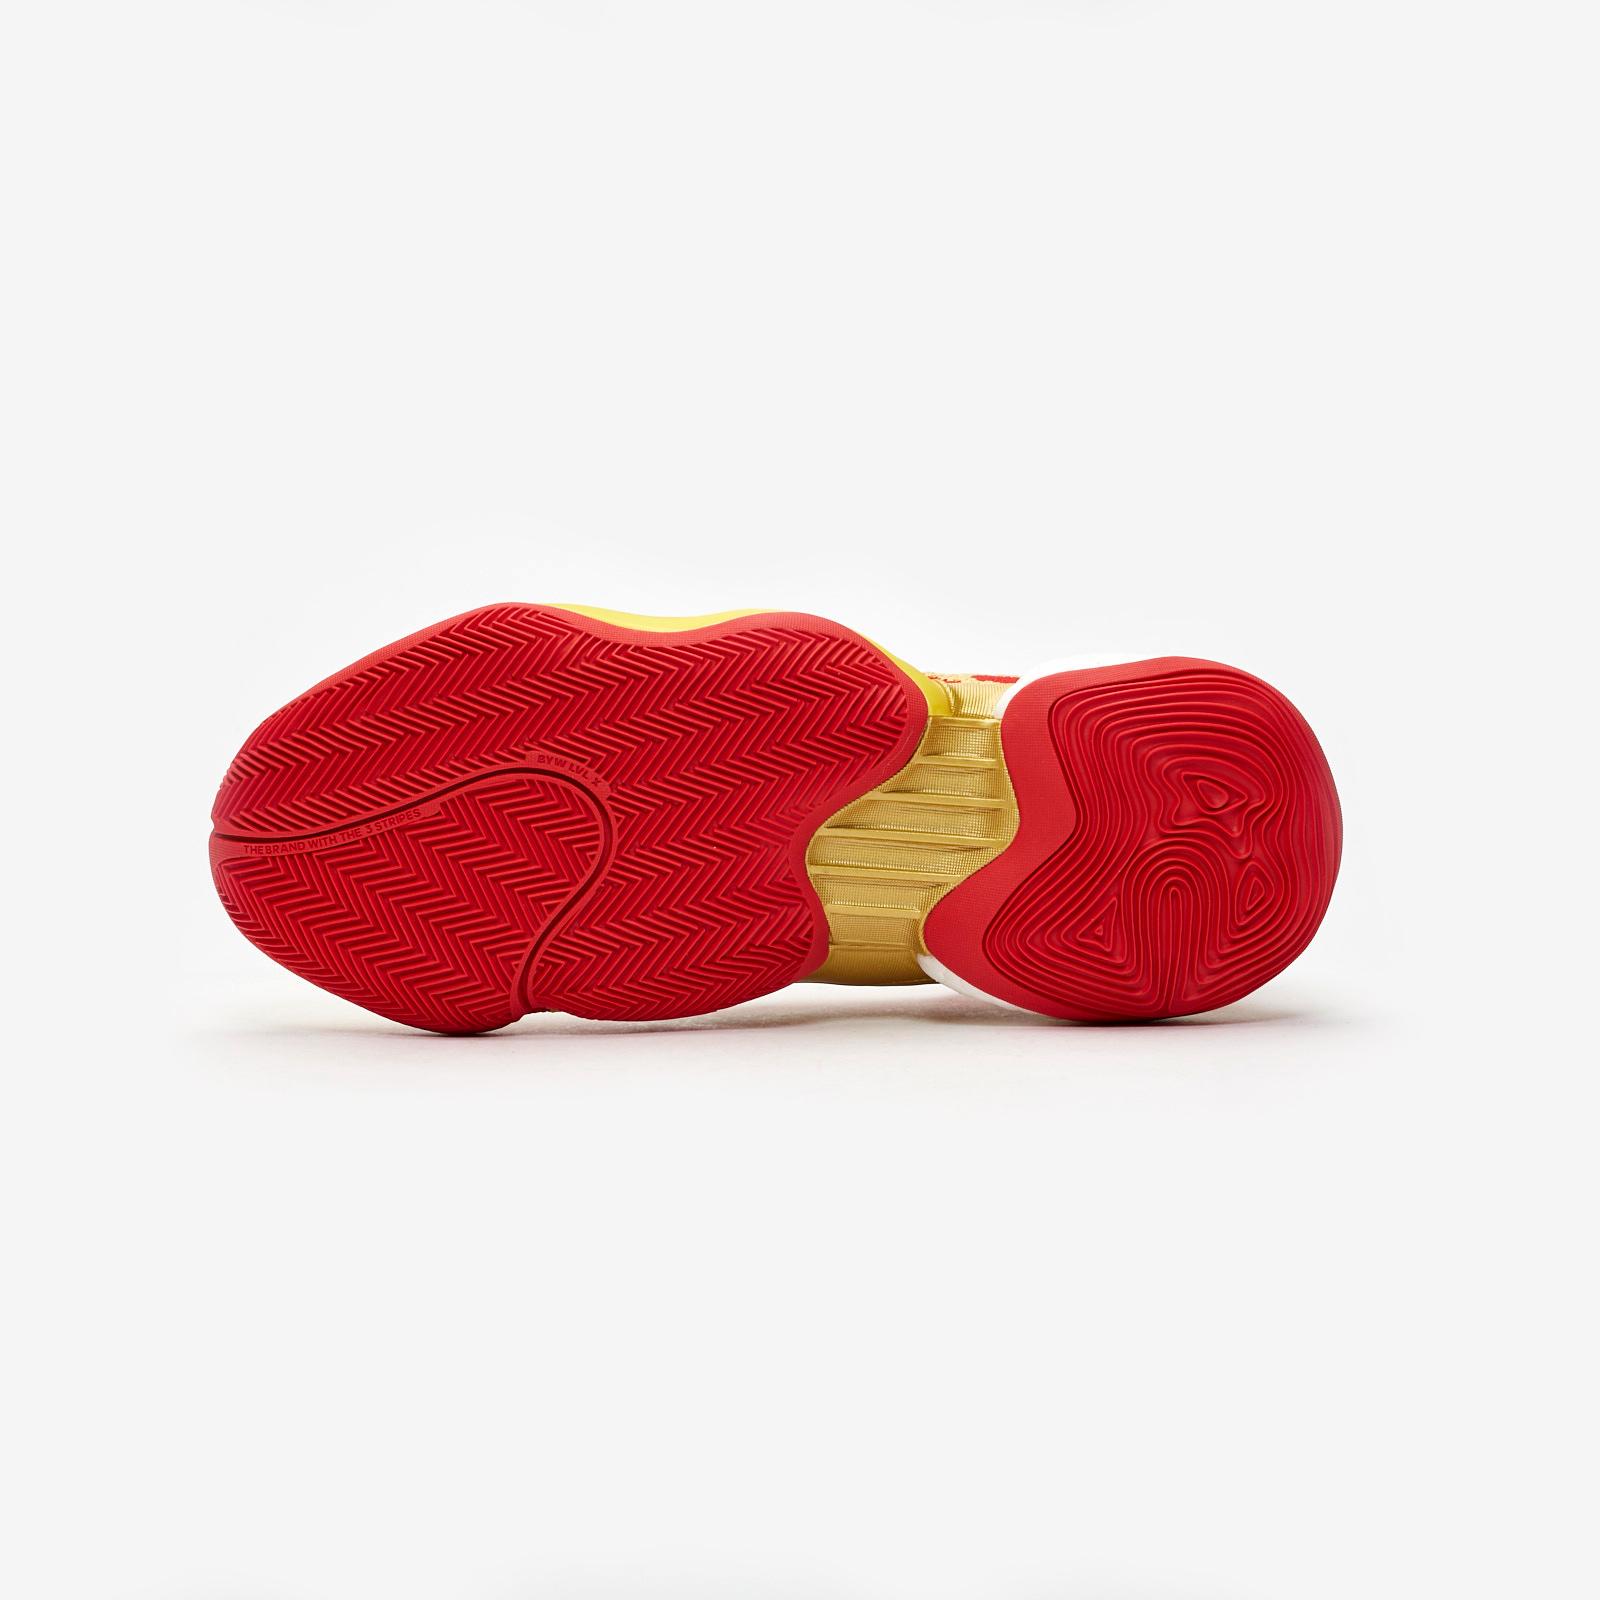 411e47e5c adidas by Pharrell Williams PW X CNY BYW - 7. Close